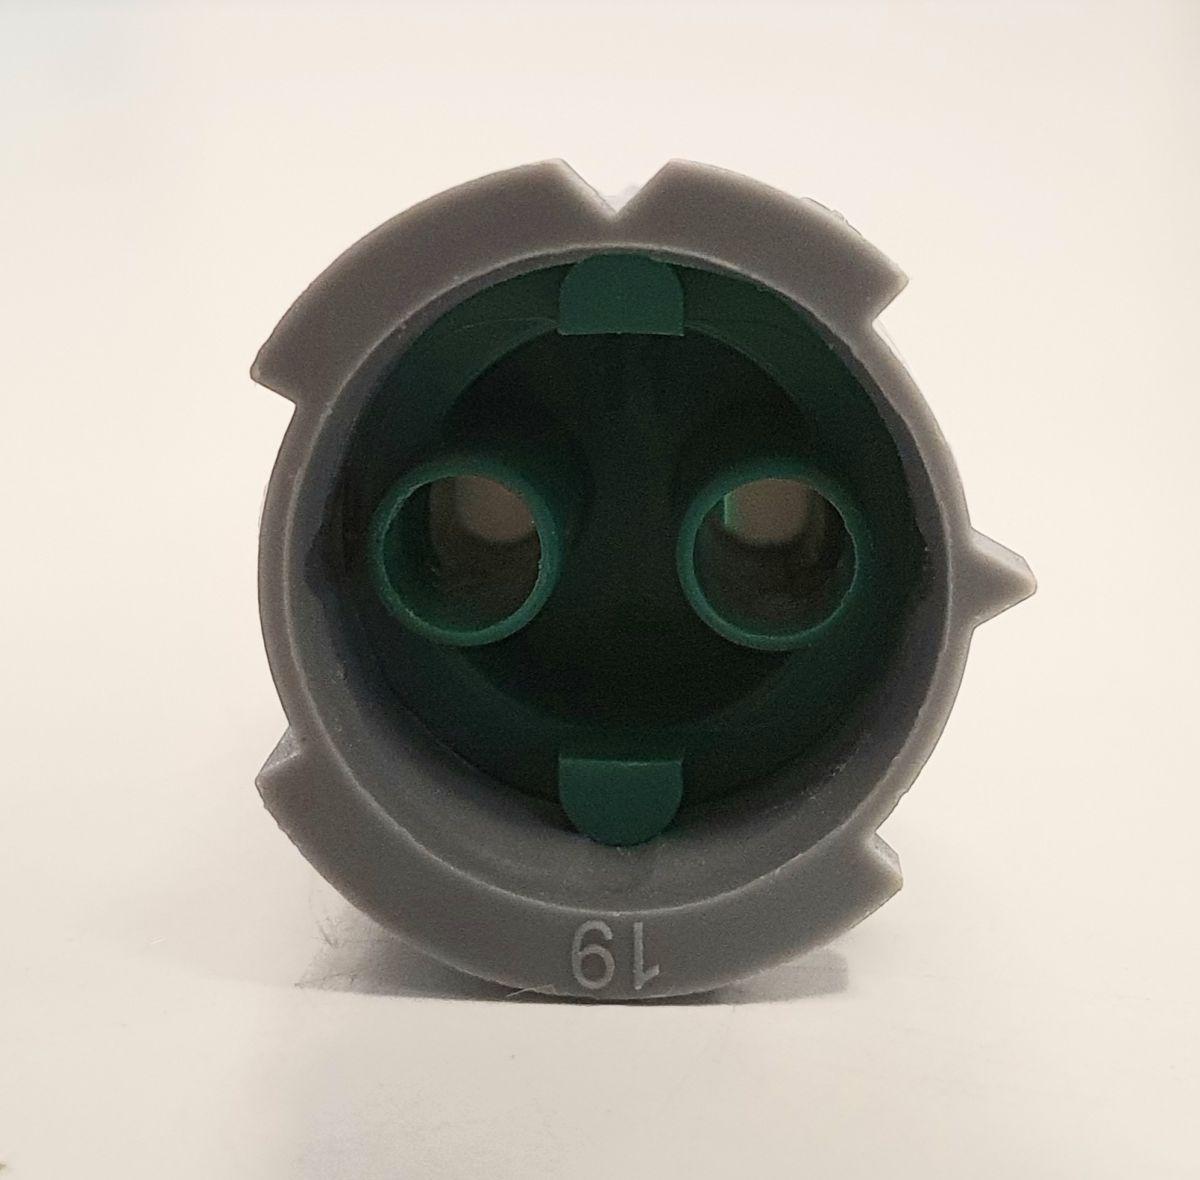 3m epxn48 square green mixing nozzle 48 ml 50 ml 11 en 12